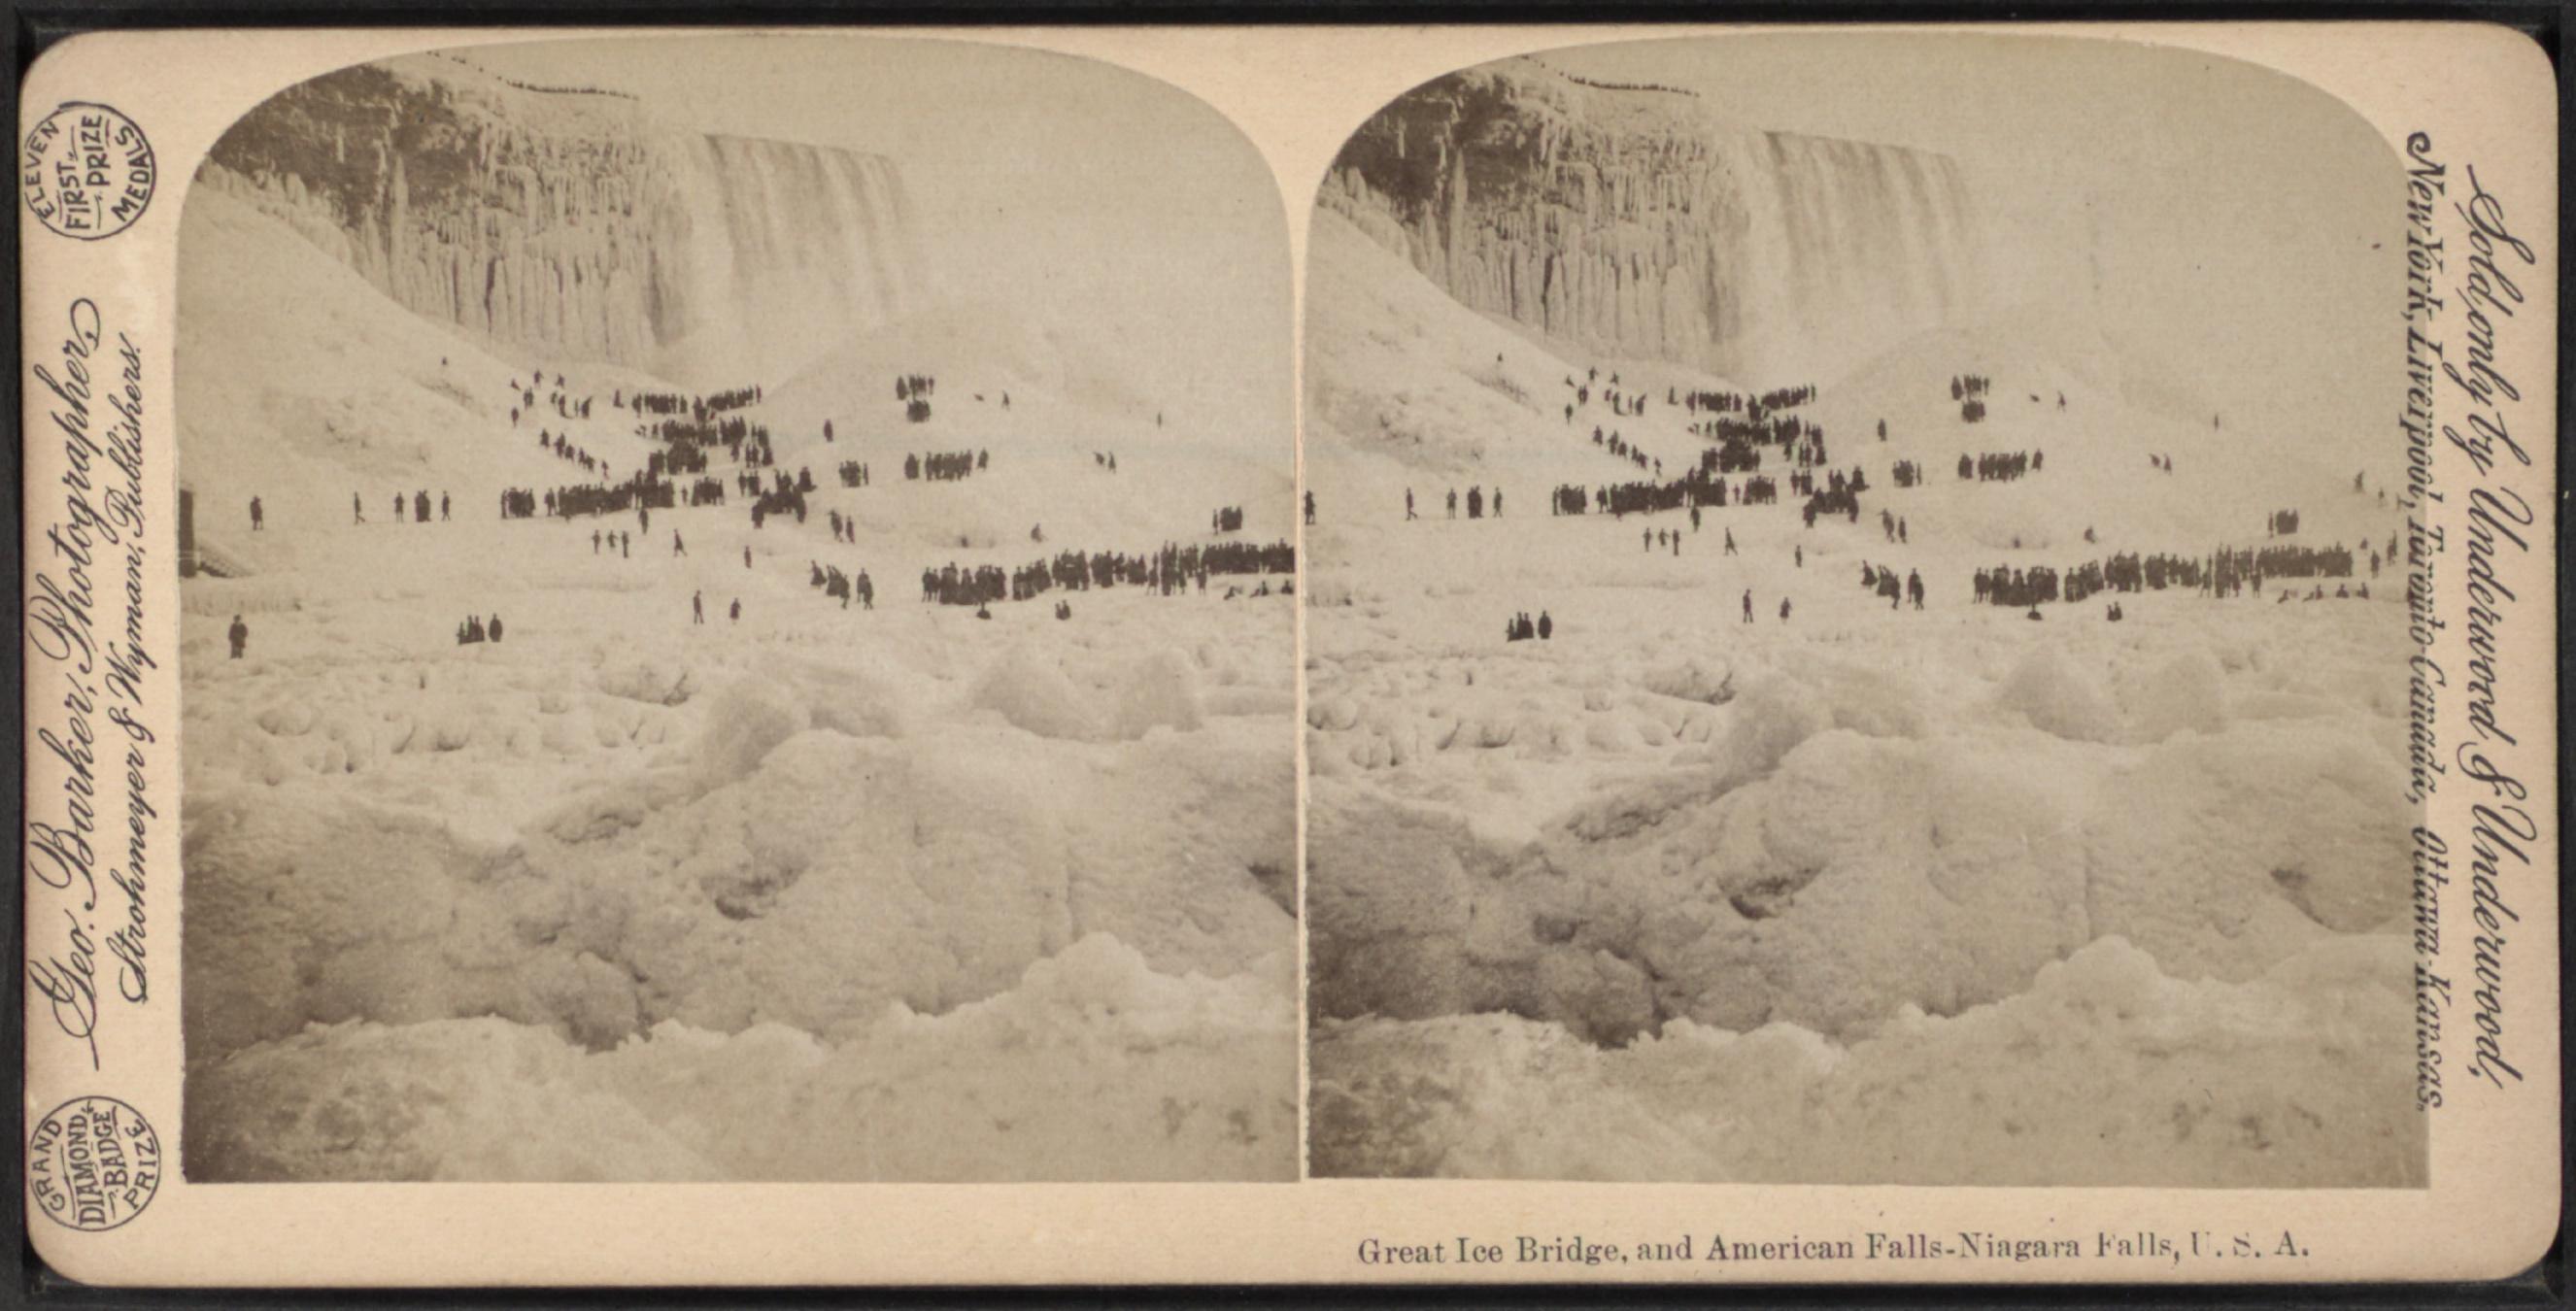 Great_Ice_Bridge,_and_American_Falls,_Niagara_Falls,_U._S._A.,_by_Barker,_George,_1844-1894